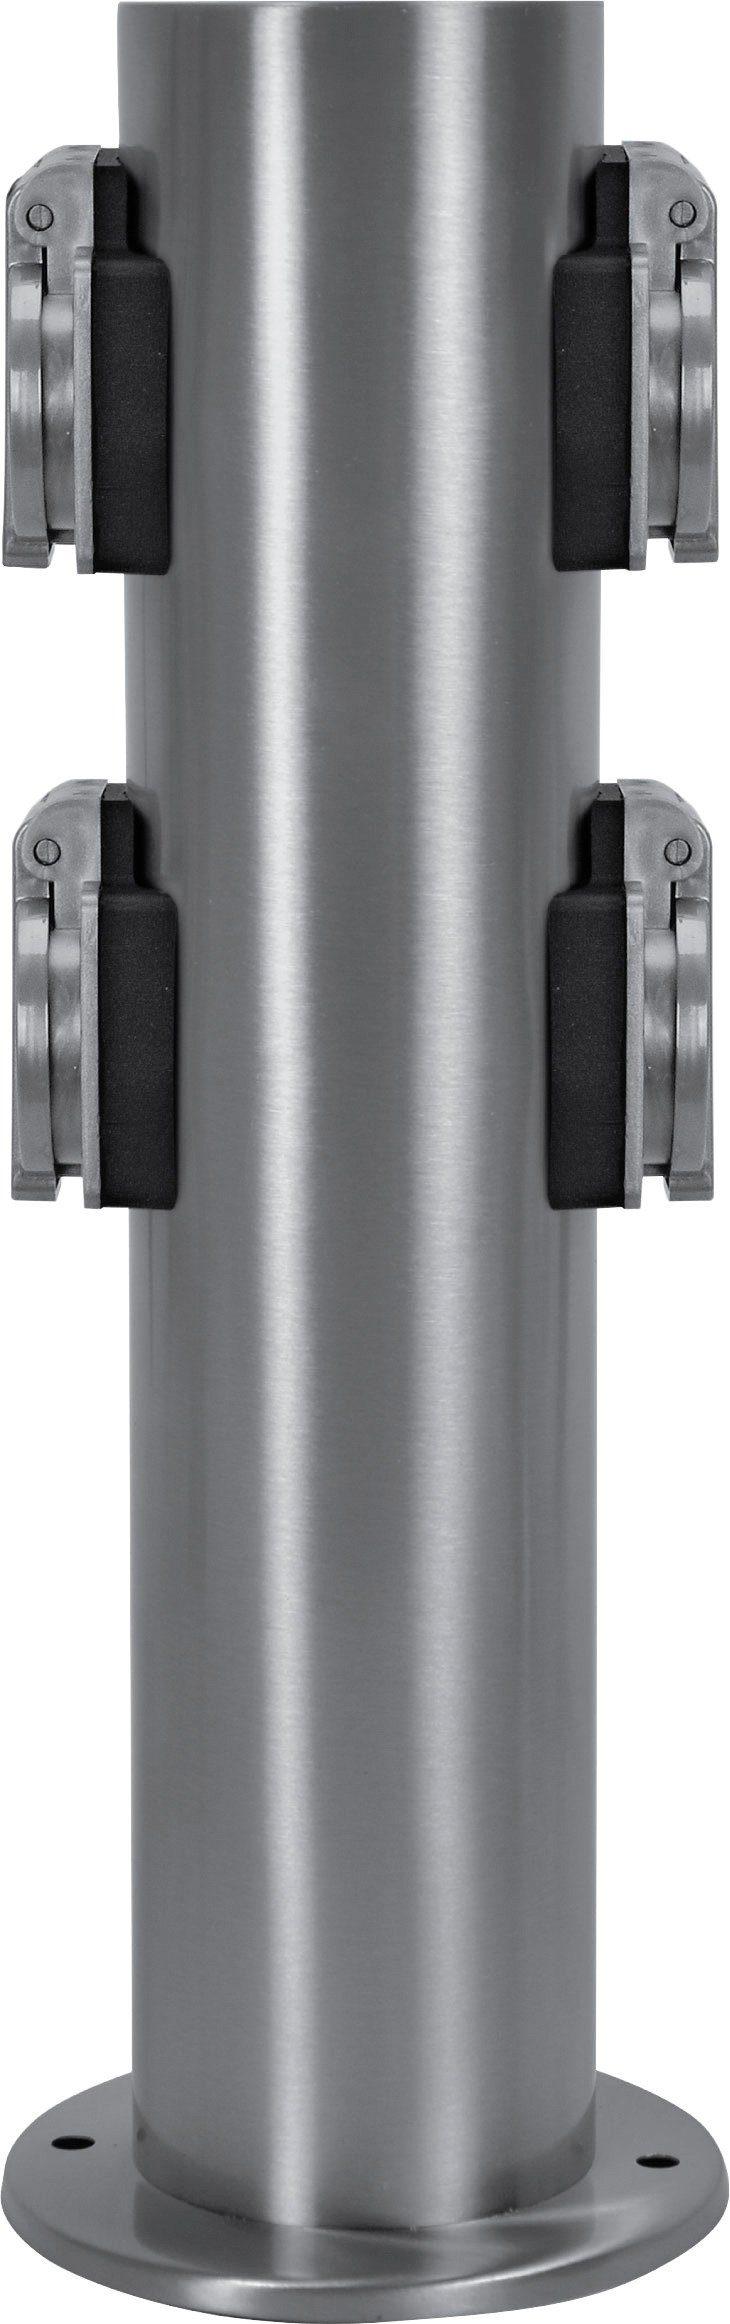 BETTERLIGHTING Steckdosensäule , Höhe: 35 cm